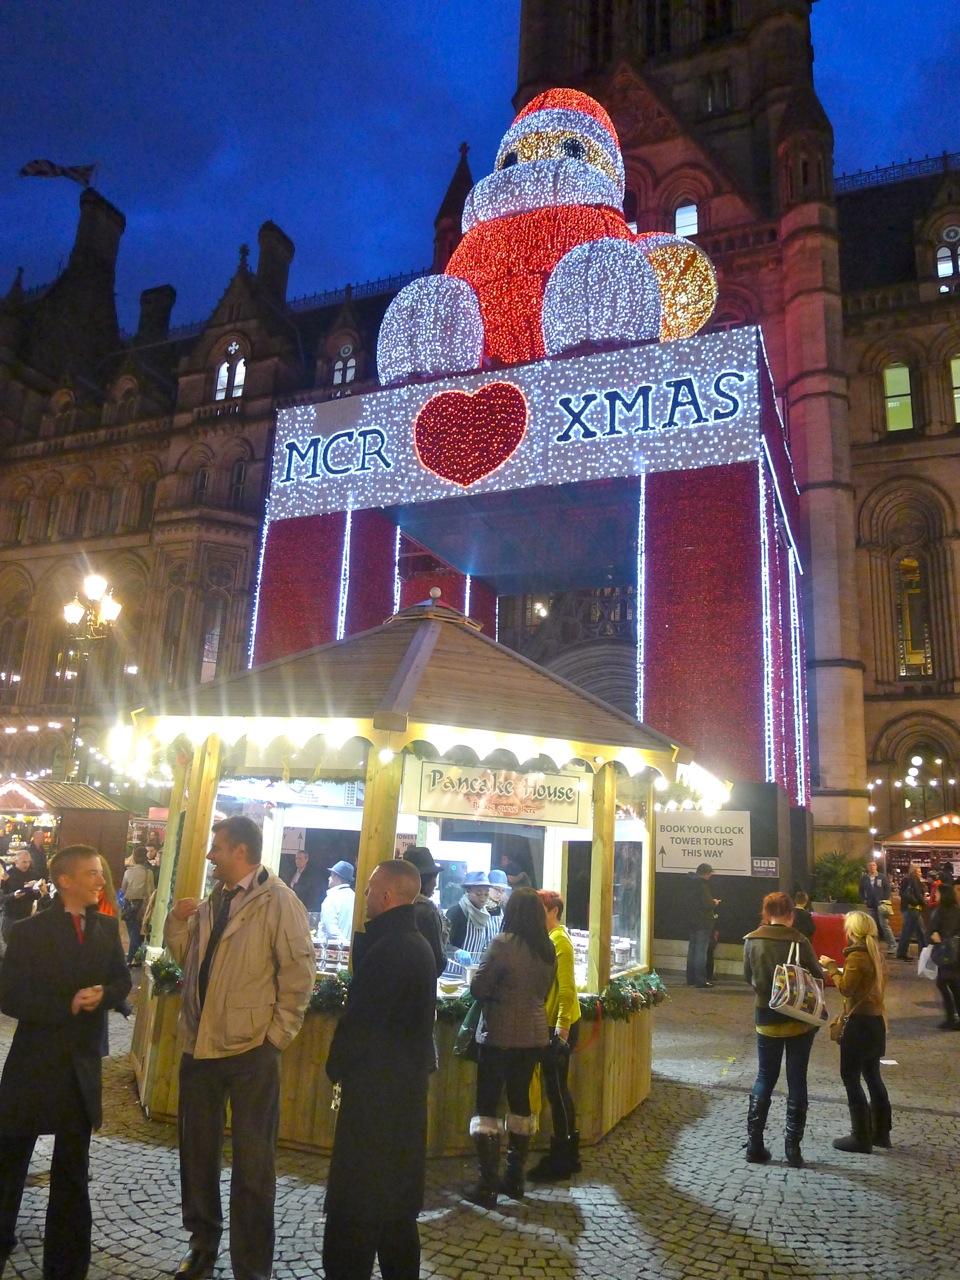 MCR_XMAS_-_Manchester_Christmas_Markets.jpg